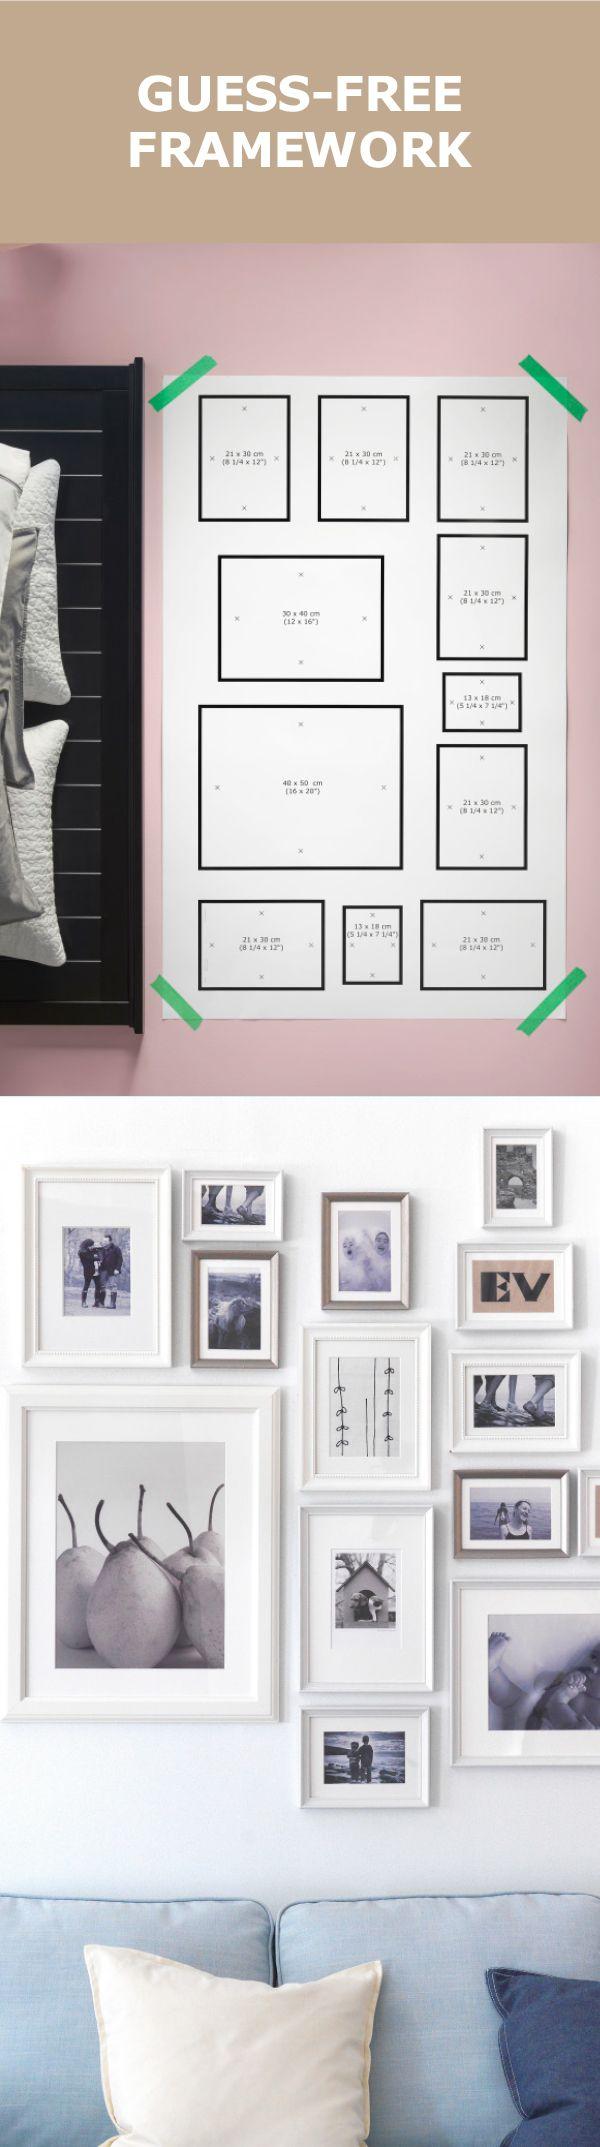 17 Best ideas about Ikea Frames on Pinterest | Entryway ...